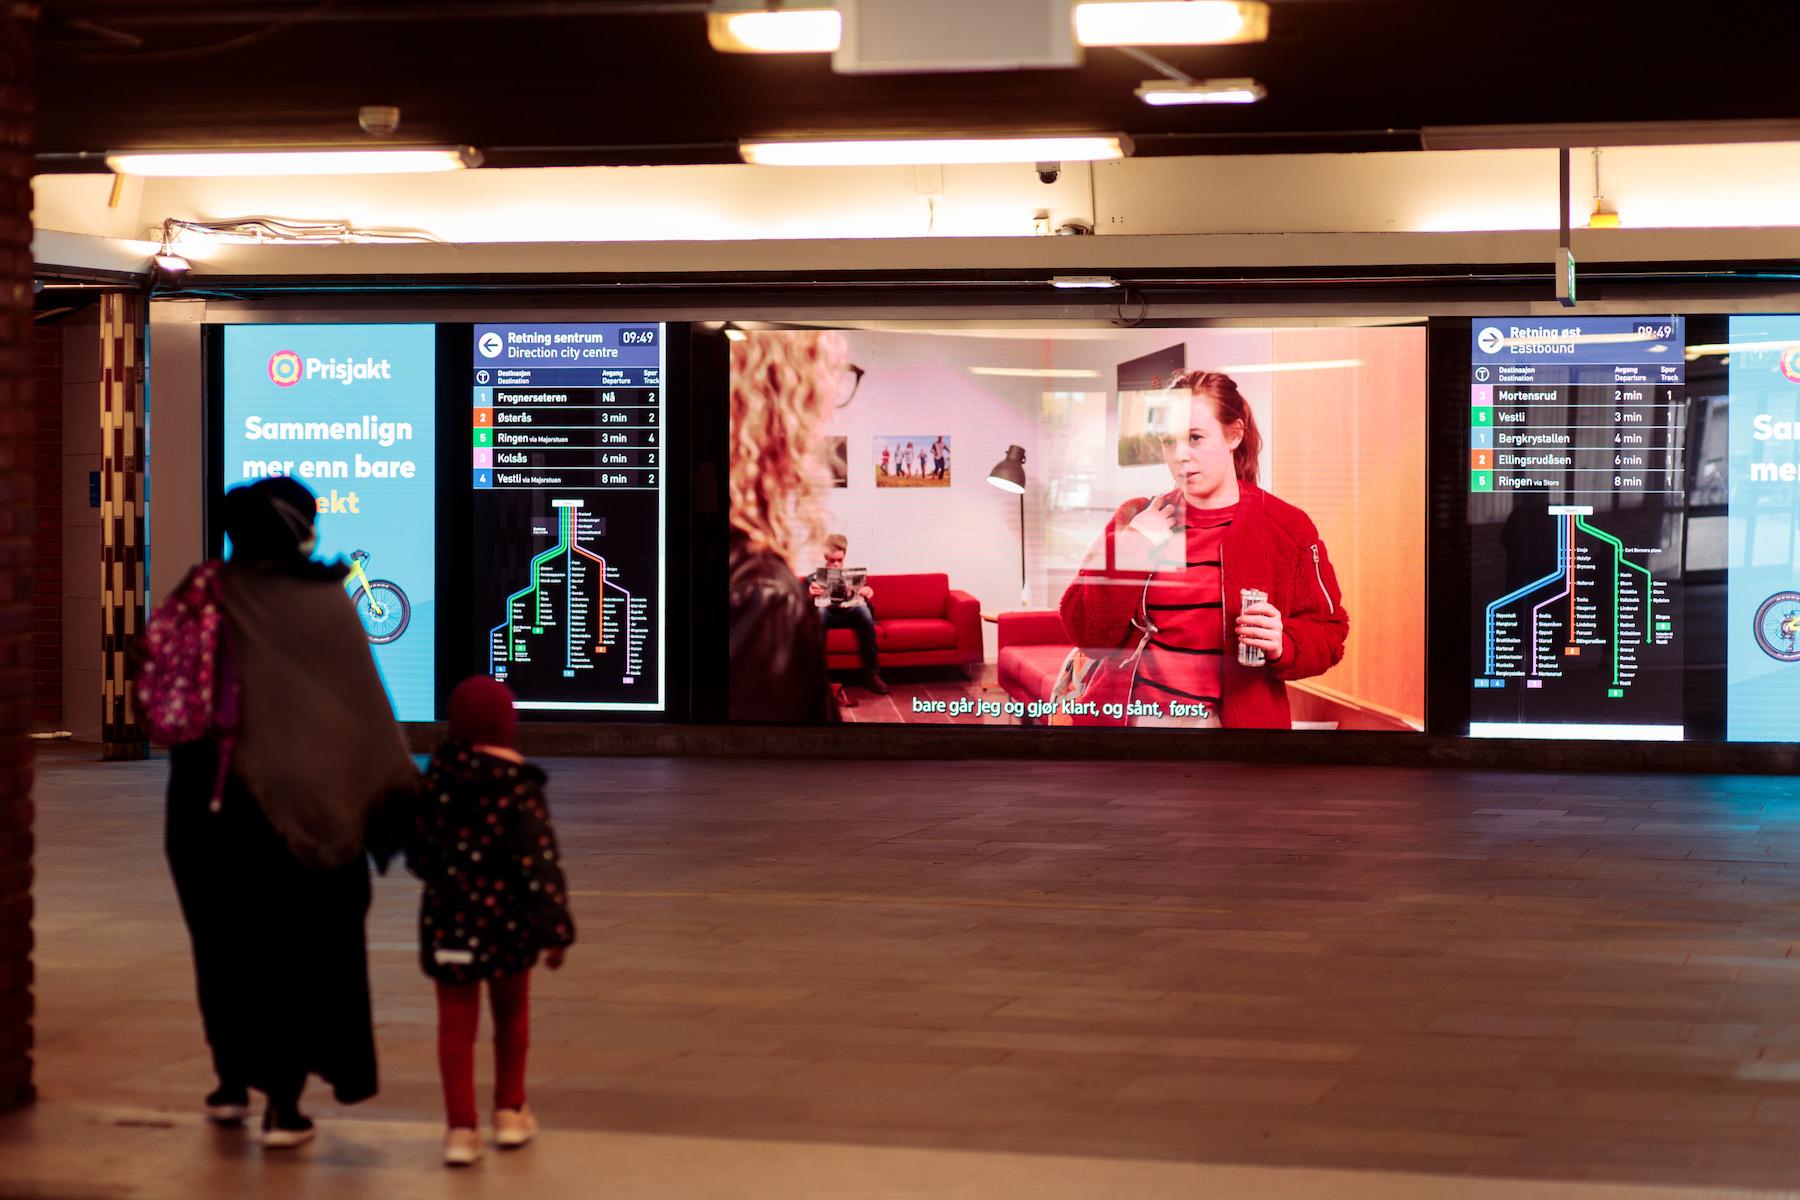 Oslo 2, Speech, installed at Tøyen T-bane stop 2021